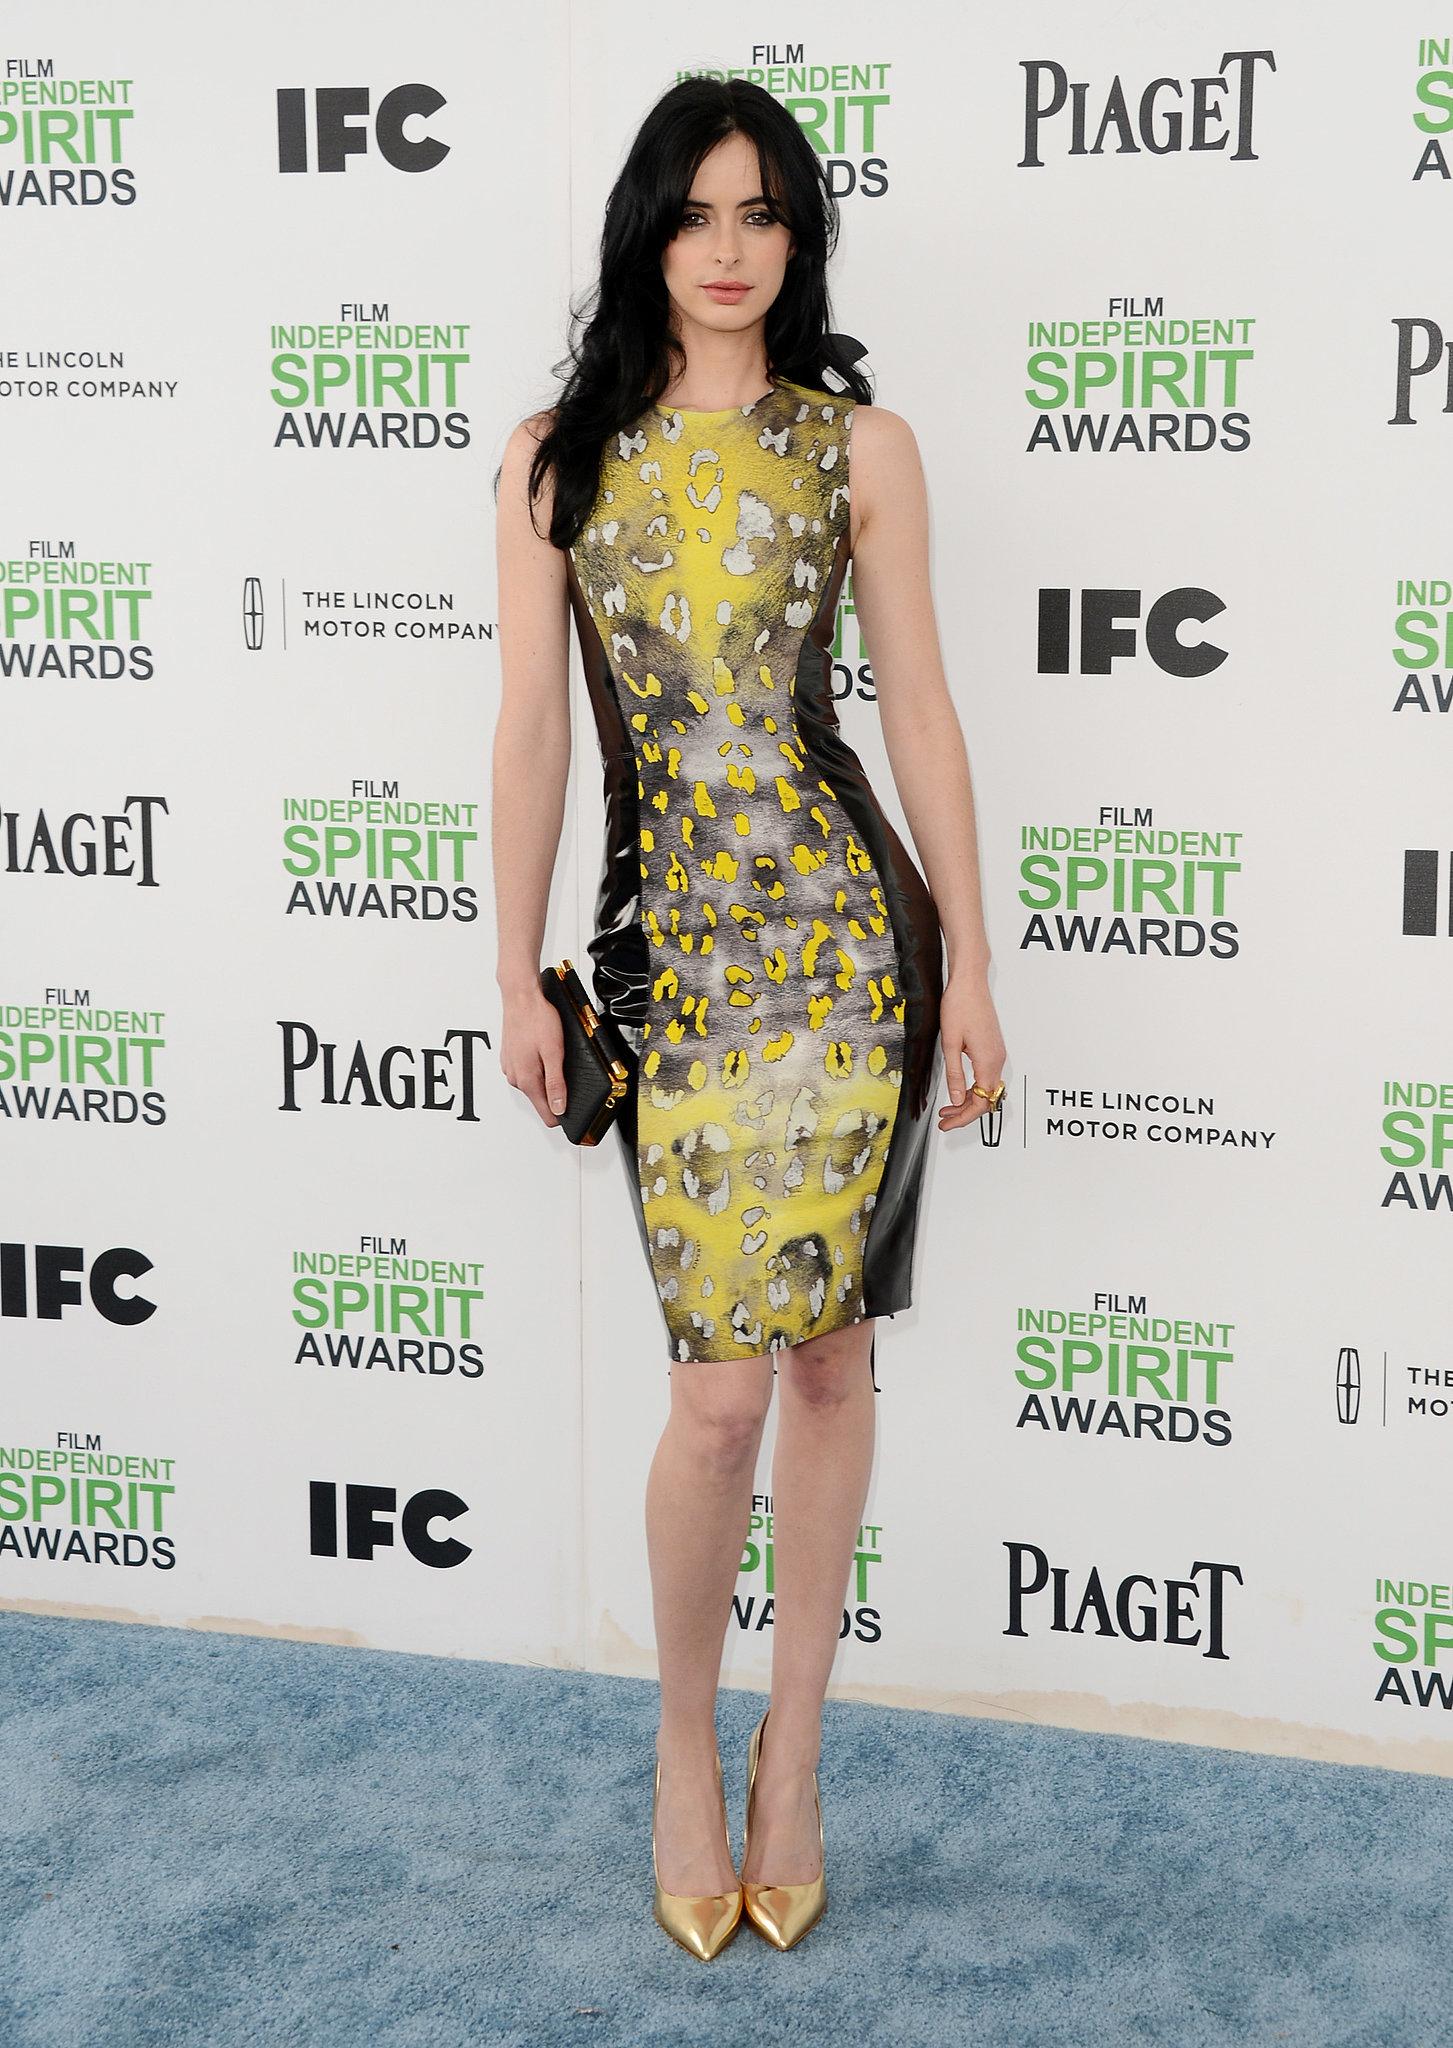 Krysten Ritter at the 2014 Spirit Awards